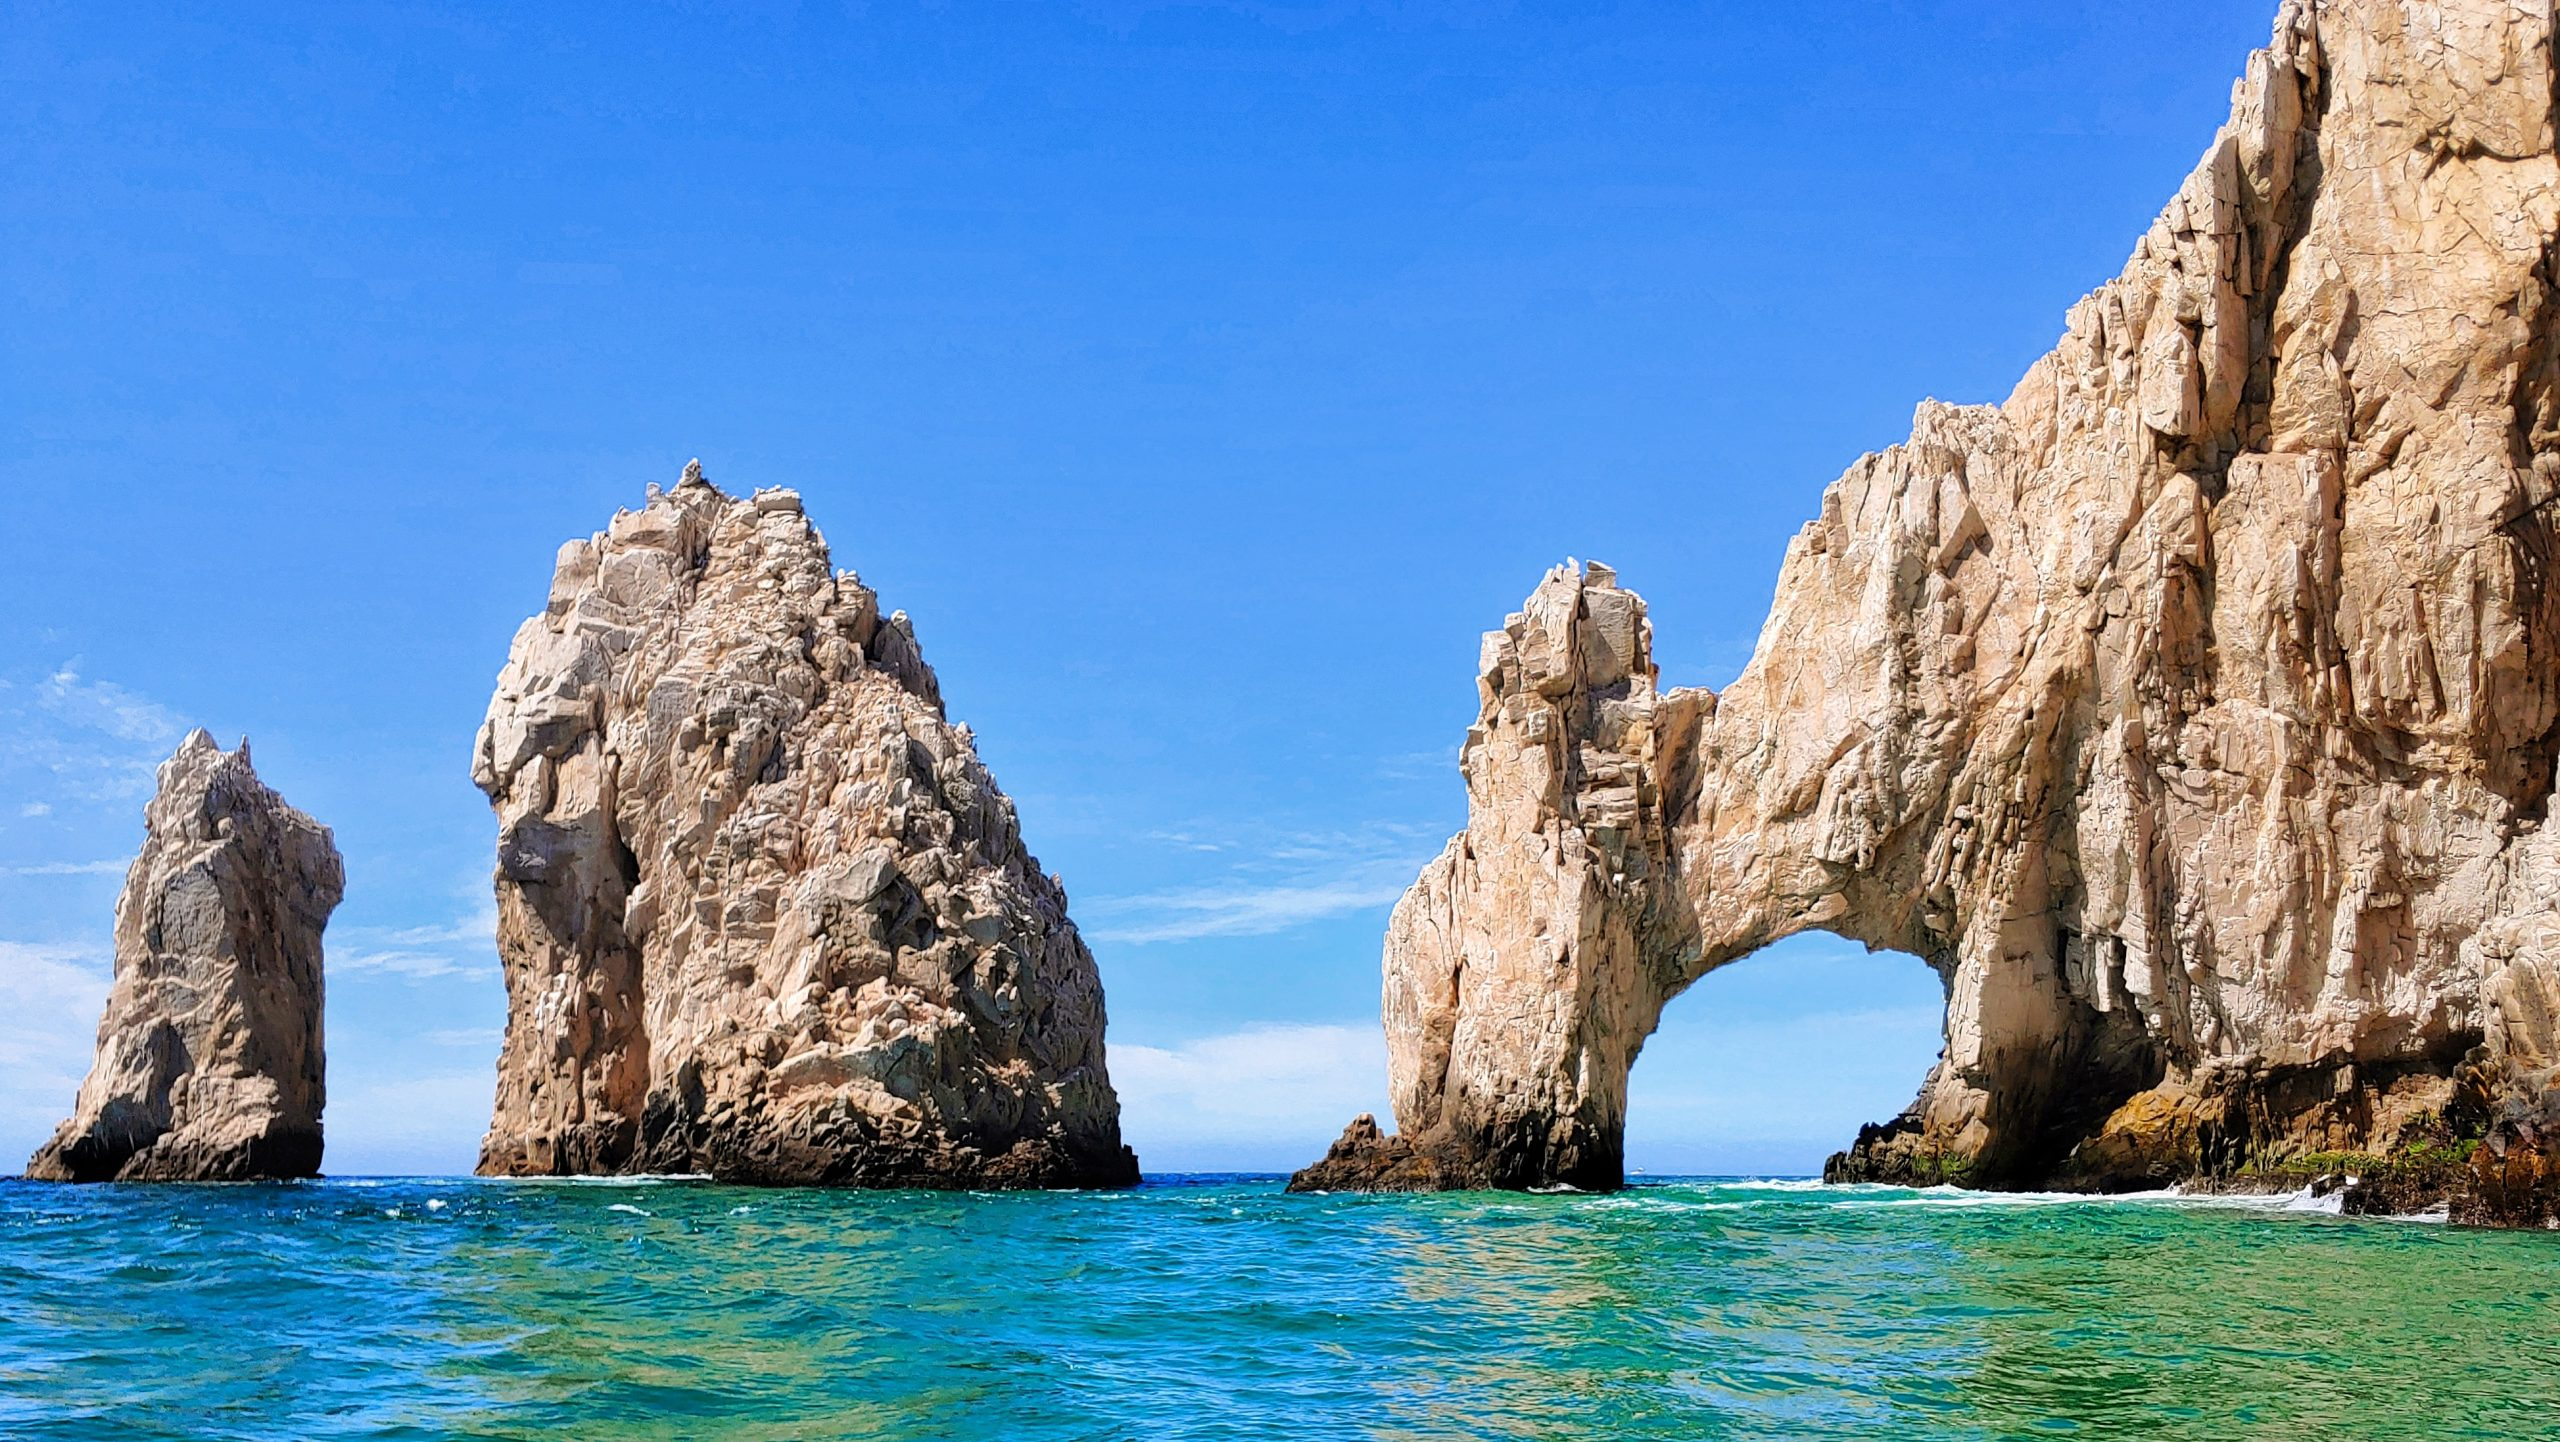 Baja California By Mario Mendez [unsplash]